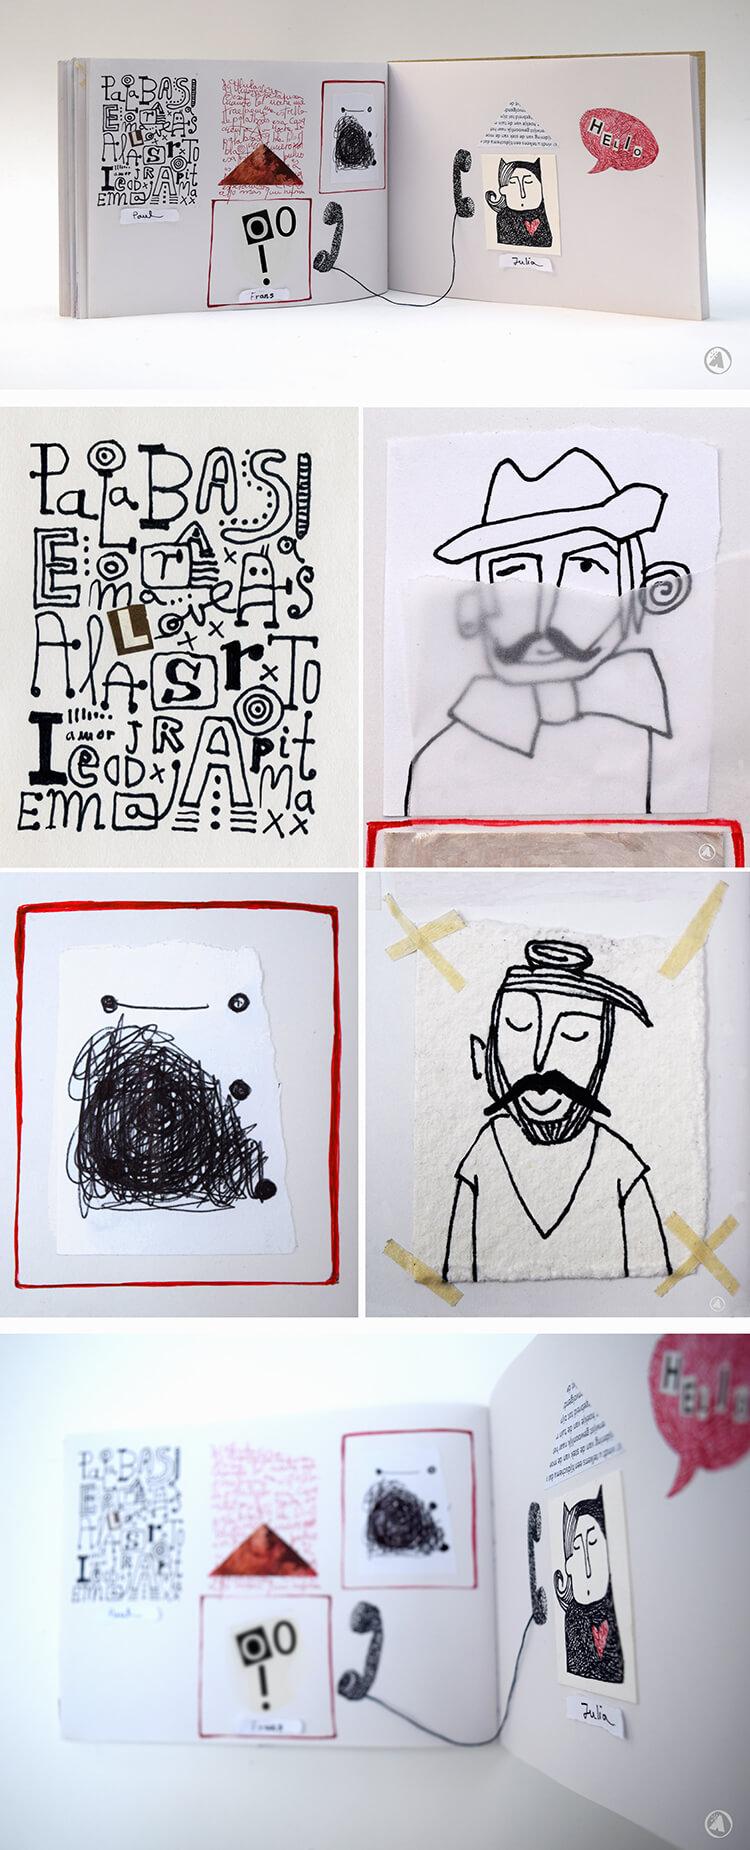 Illustrations by Angeles Nieto